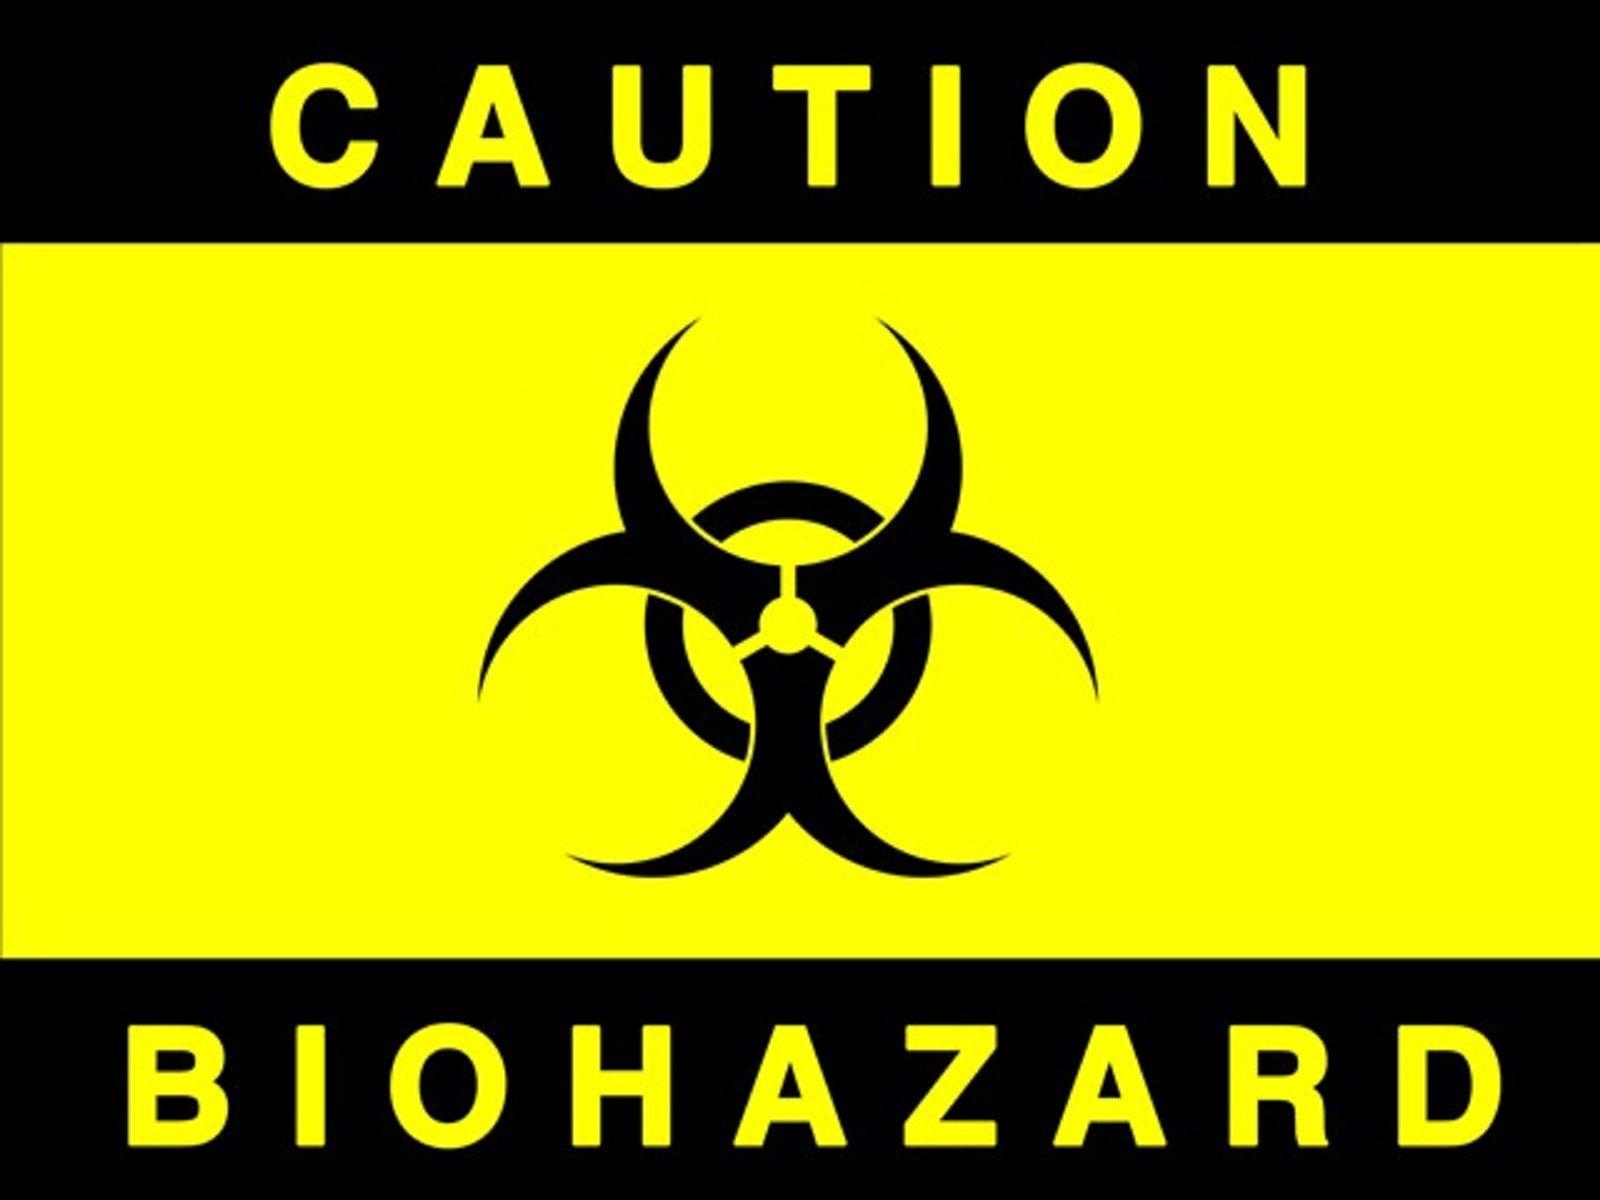 Pin By Dee Lish On Apothecary Bottles Tutorials Vial Labels Biohazard Symbol Biohazard Biological Hazard